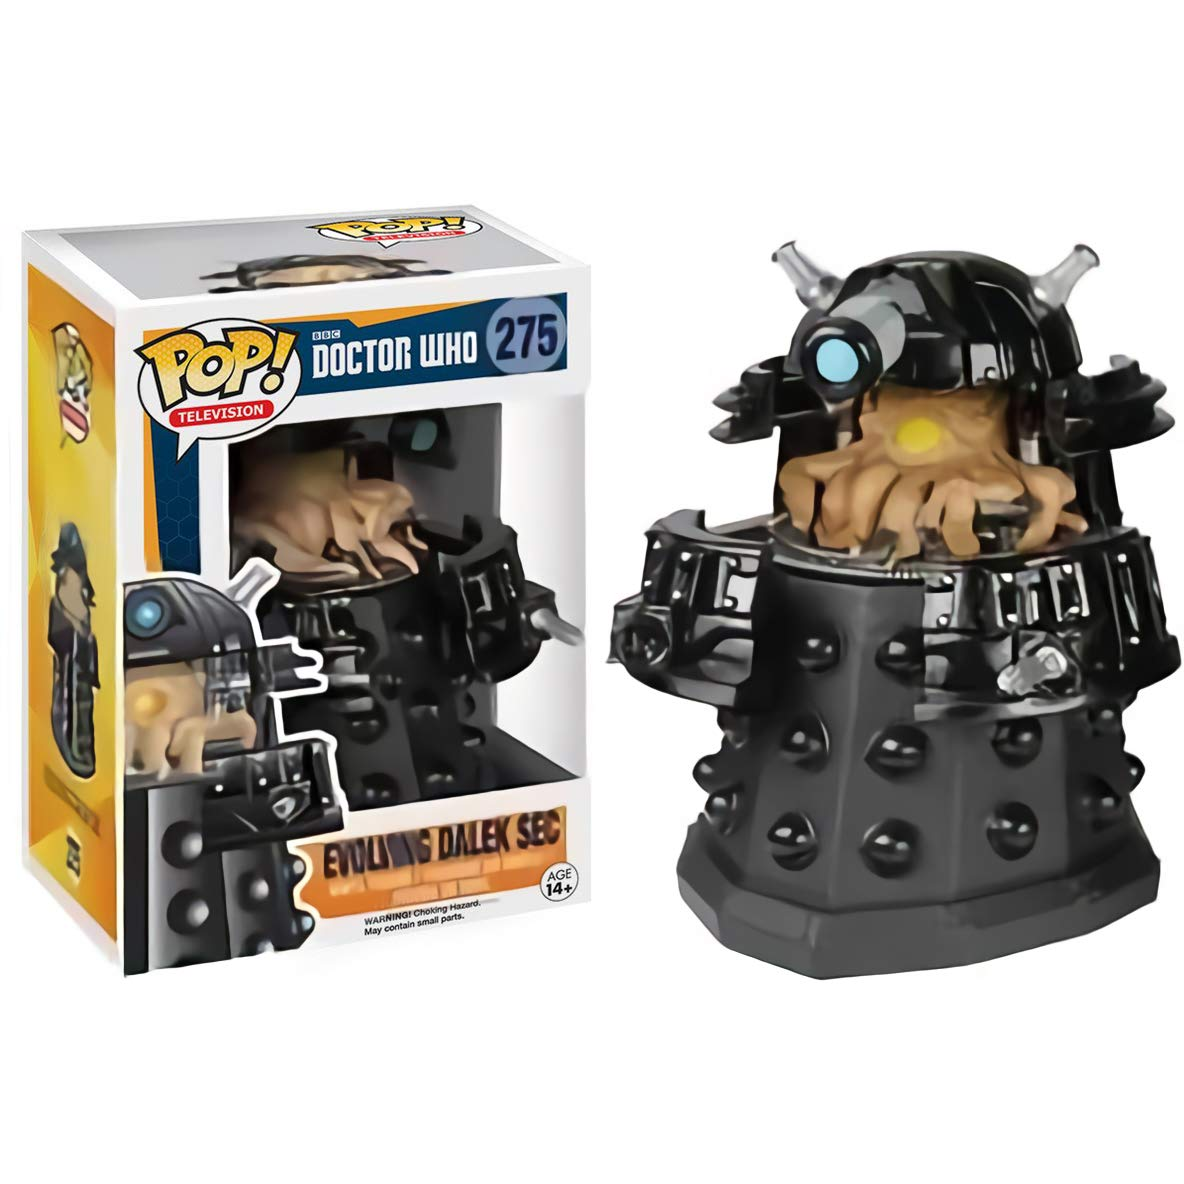 TV Vinyl Figure /& 1 PET Plastic Graphical Protector Bundle BCC9406822 Funko Evolving Dalek Sec #275 // 05786 - B GameStop Exclusive : Doctor Who x POP